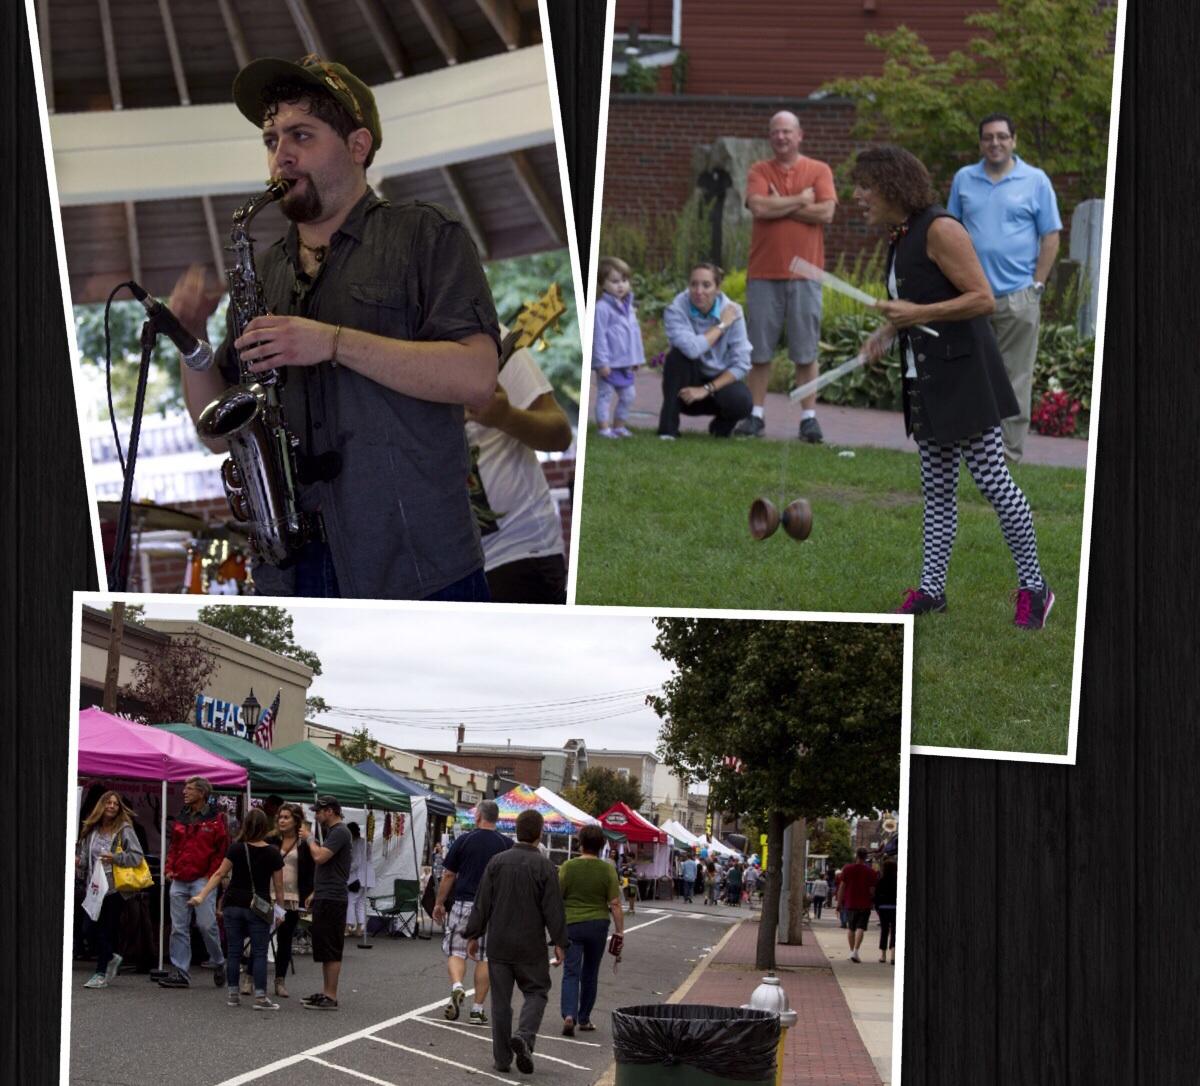 Village Kitchen Farmingdale: Farmingdale Music Festival Was A Mid-September Blast